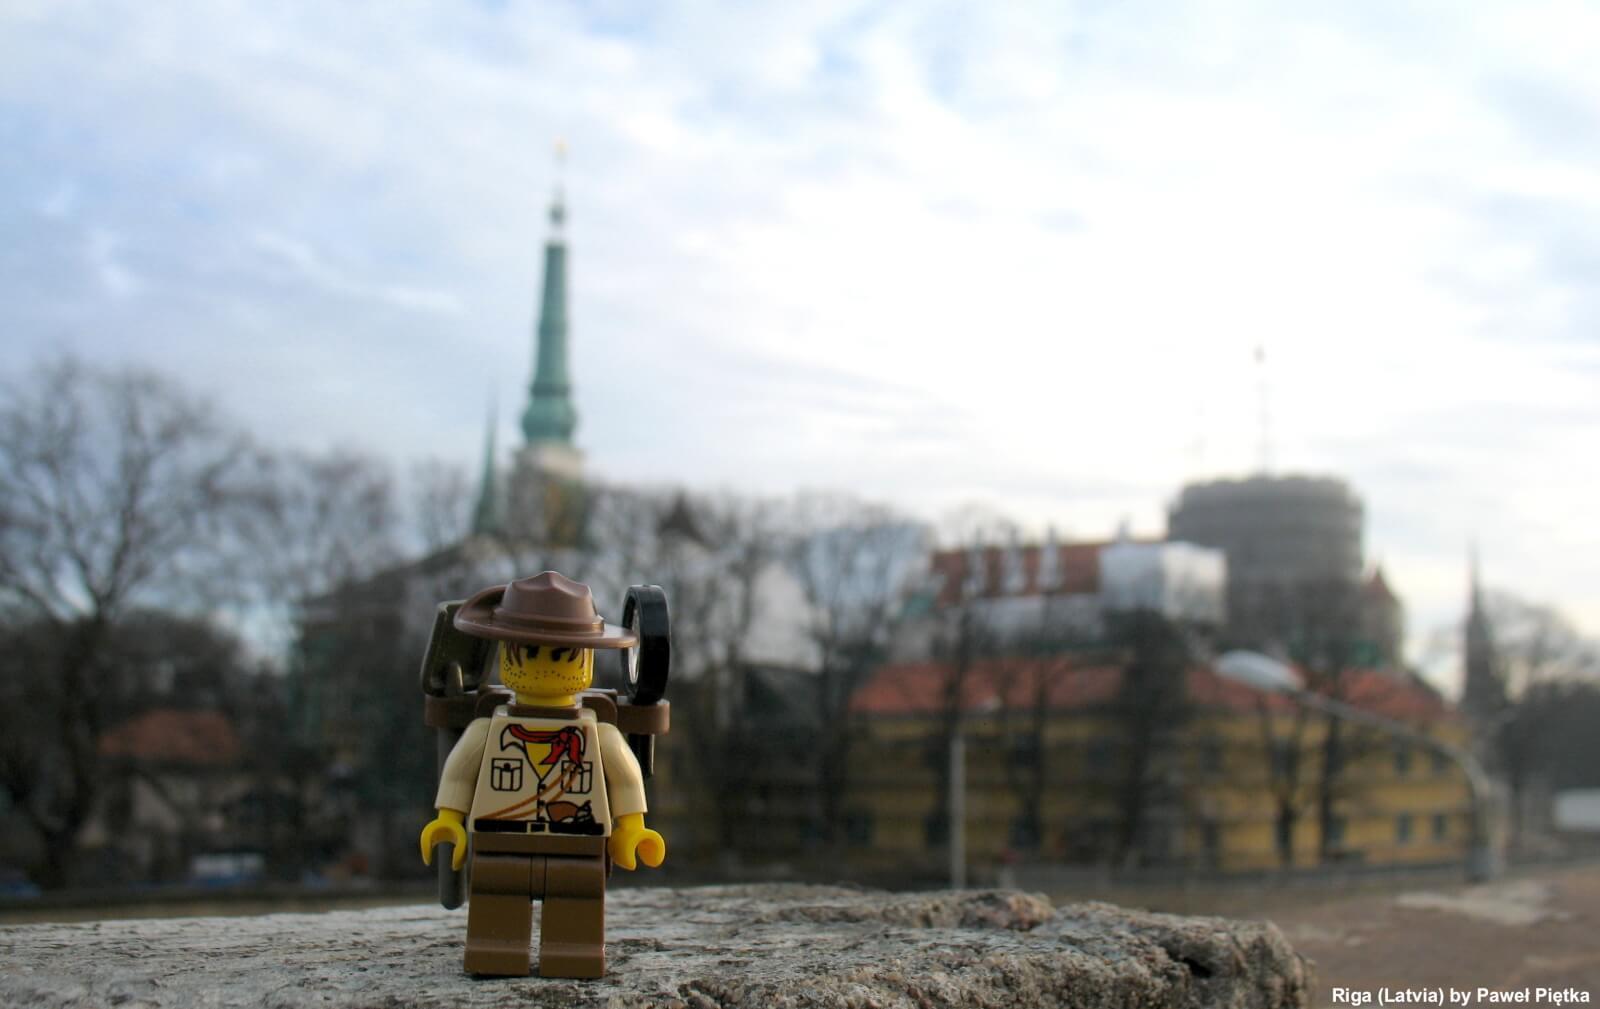 Riga (Latvia) - Riga Castle